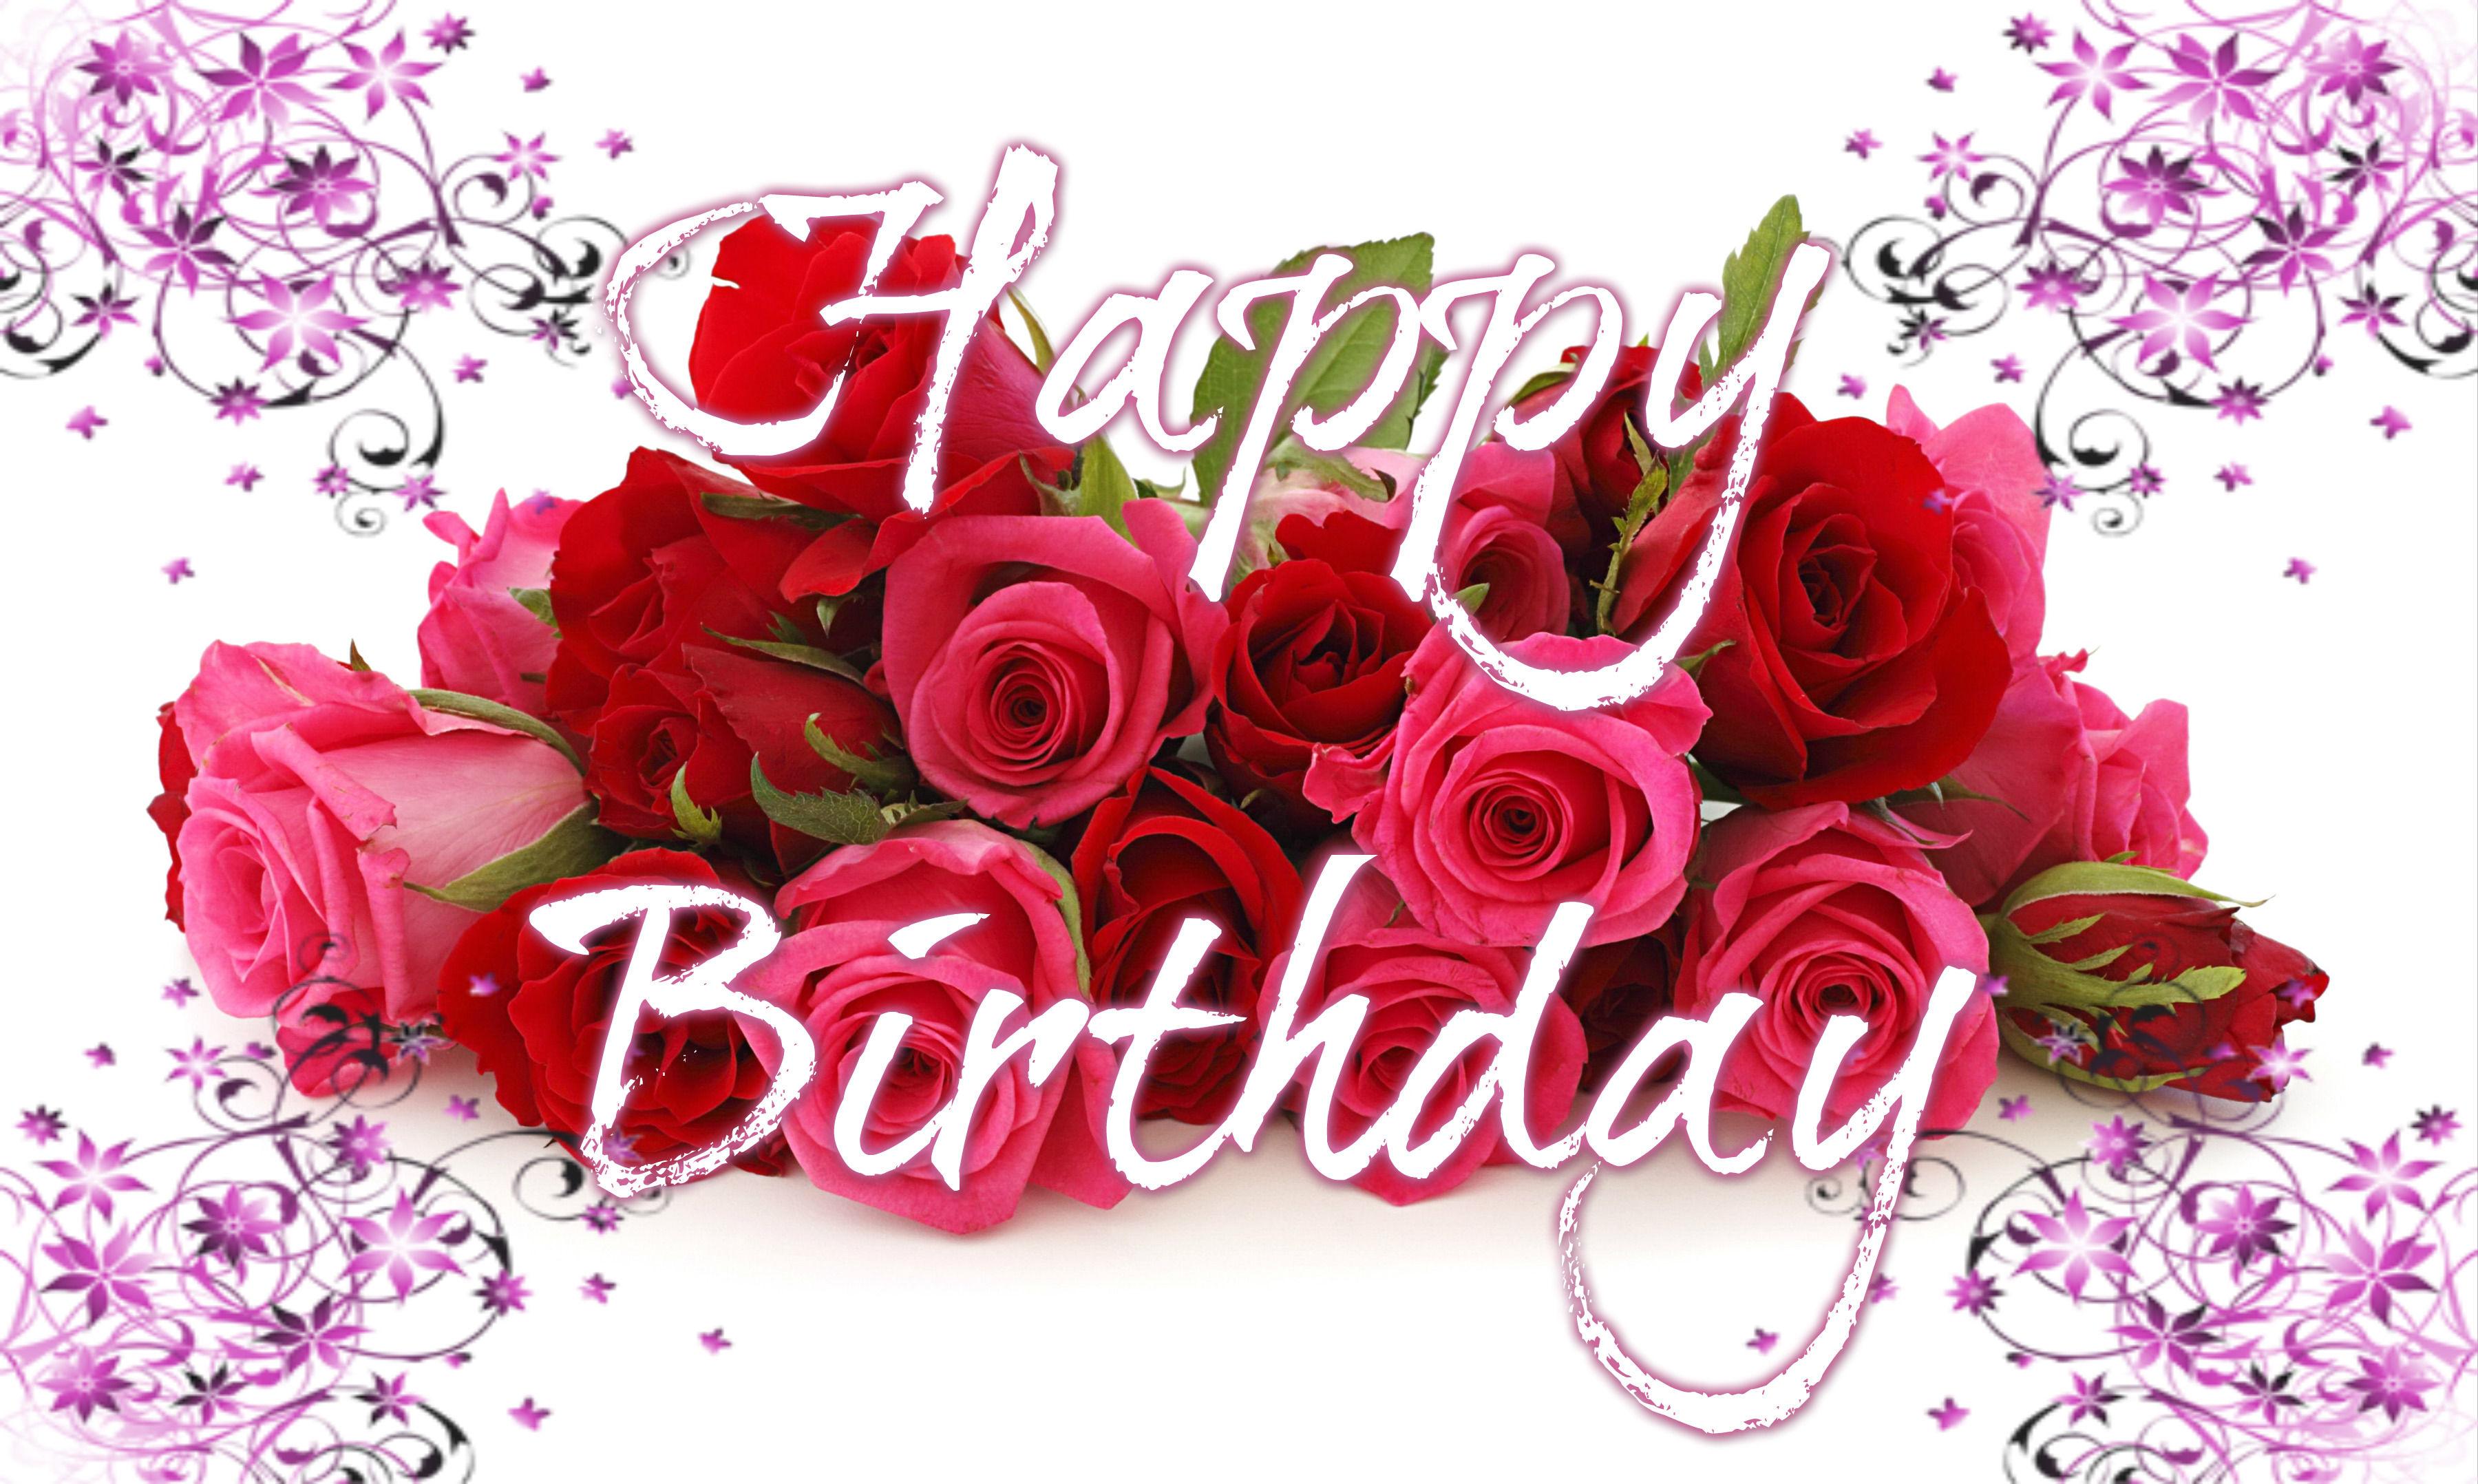 Happy Birthday images - Happy Birthday images - Wallpapers, hd-wallpapers, HD, Free, Birthday, 4k-wallpapers, 4k